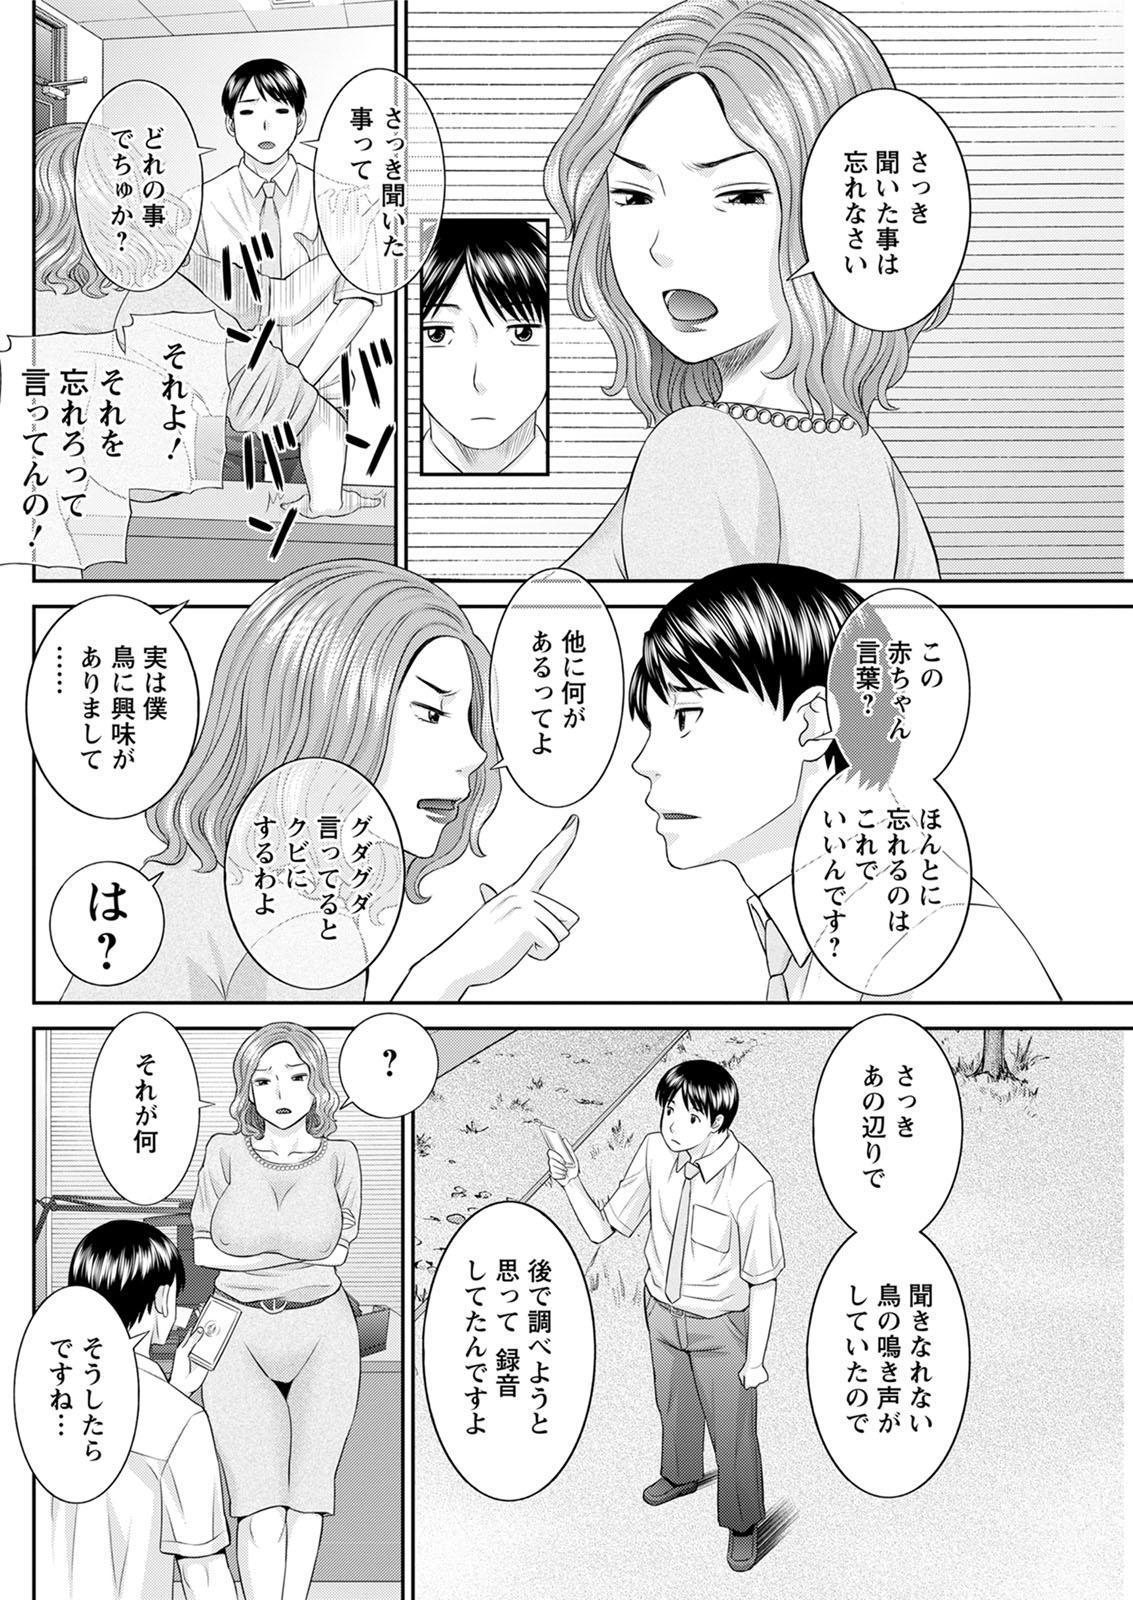 [Kawamori Misaki] Kaikan Hitotsuma Gakuen Ch. 1-6, 8-20 [Digital] 226